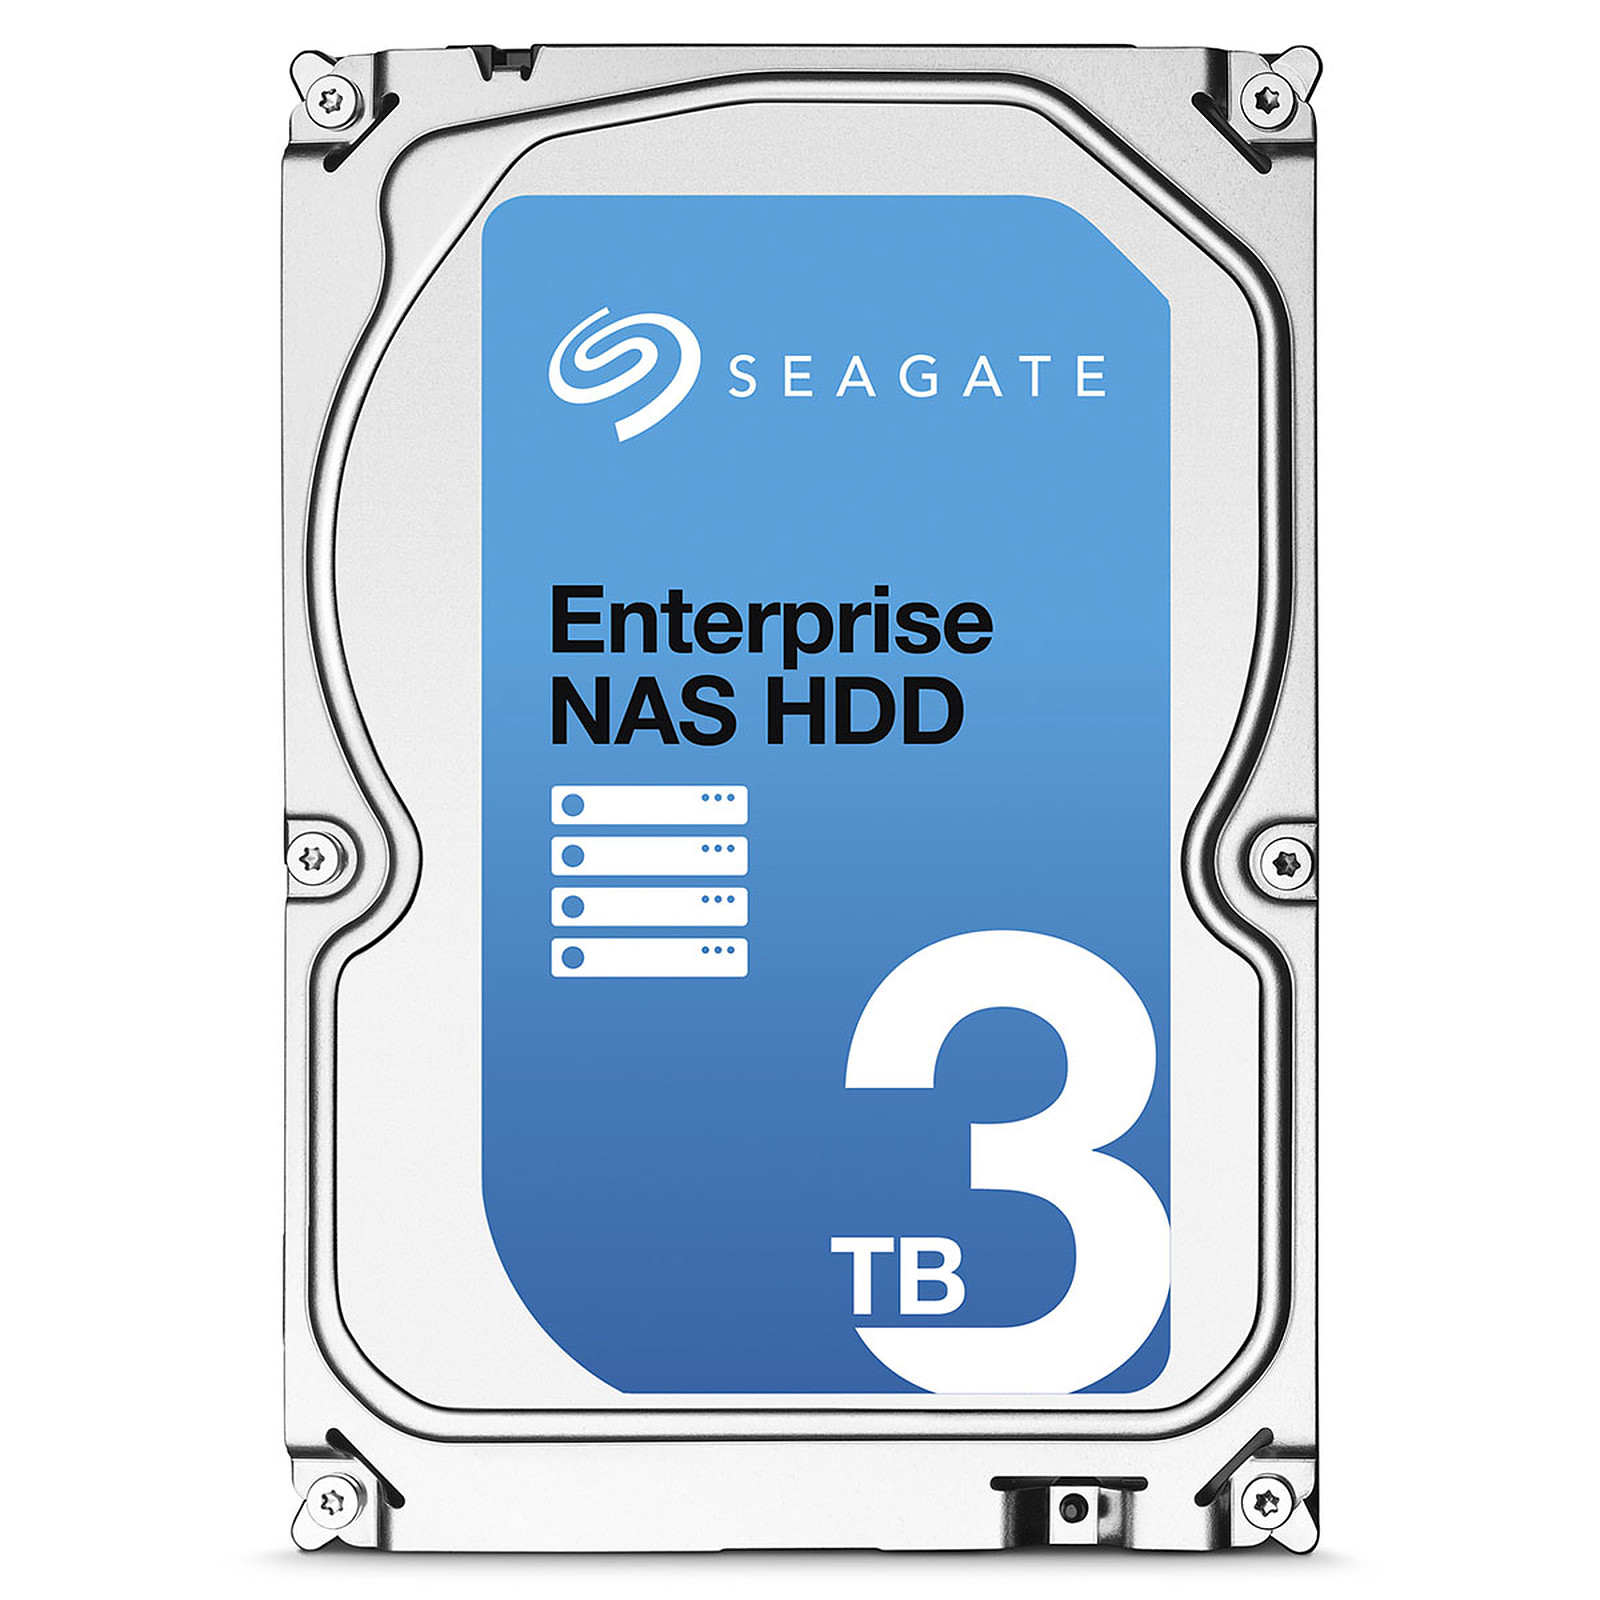 Seagate Enterprise NAS HDD 3 To